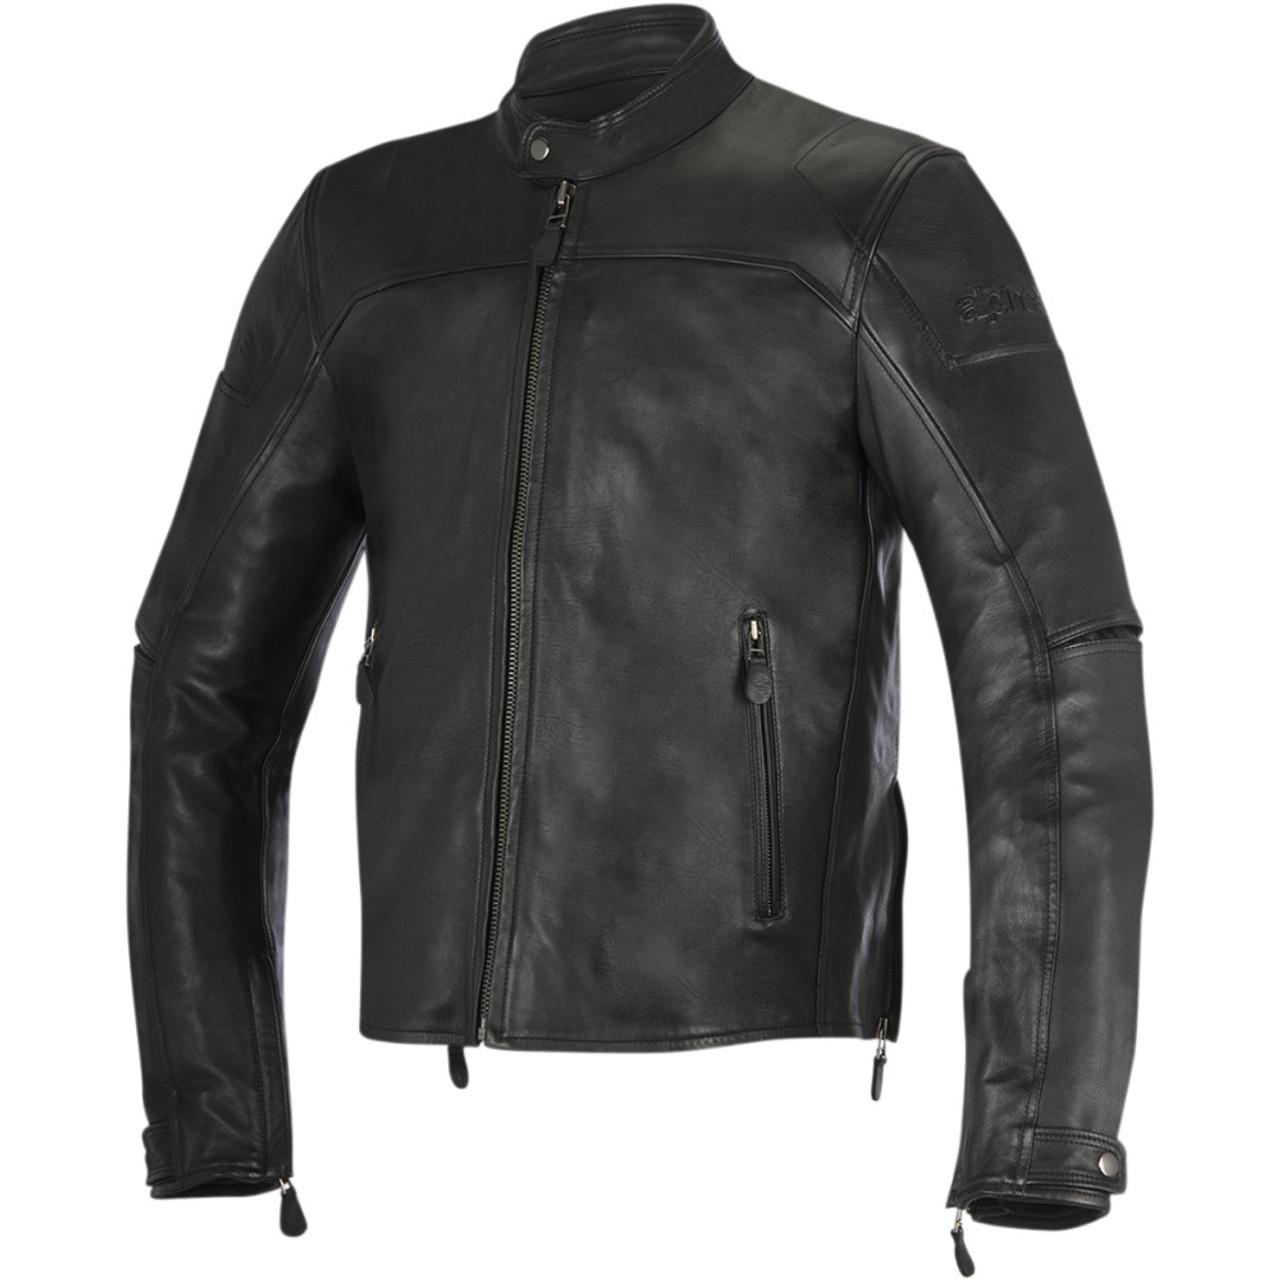 Alpinestars Motorcycle Jacket >> Alpinestars Oscar Brera Leather Motorcycle Jacket Black Get